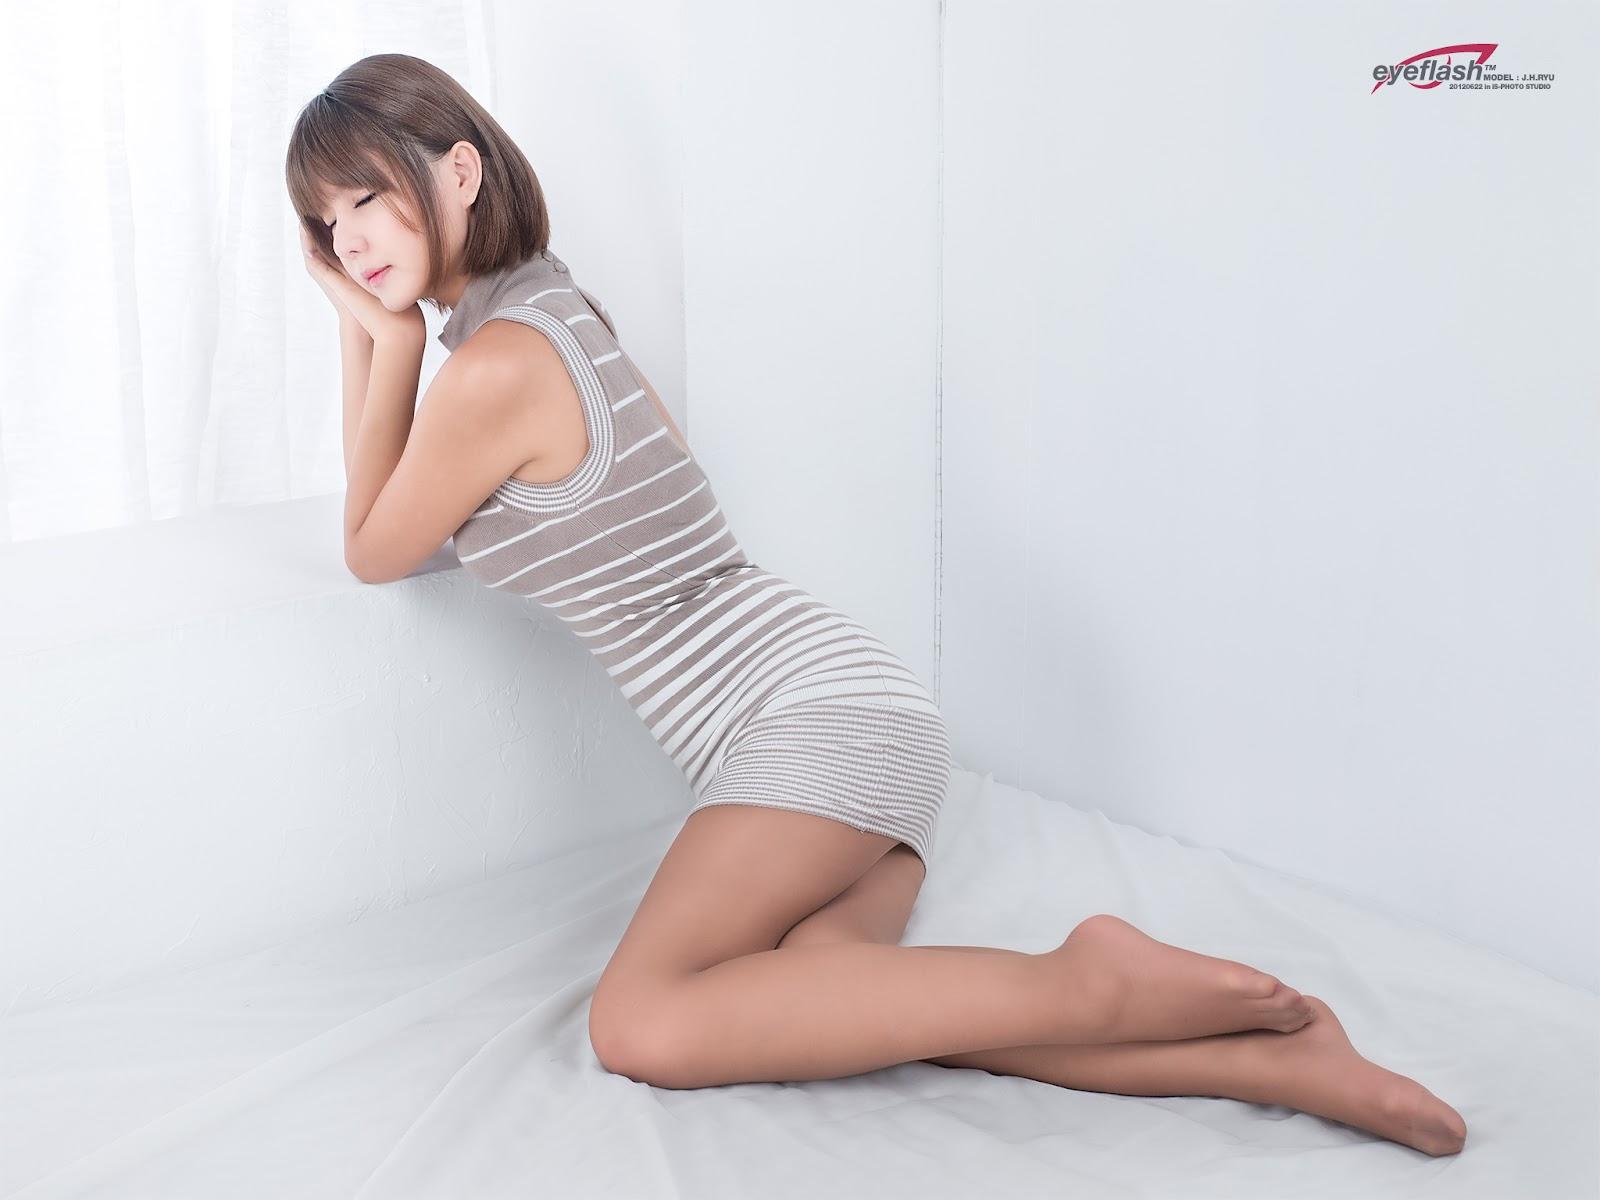 Ryu ji hye in mini dress very cute asian girl girlcute4u blogspot